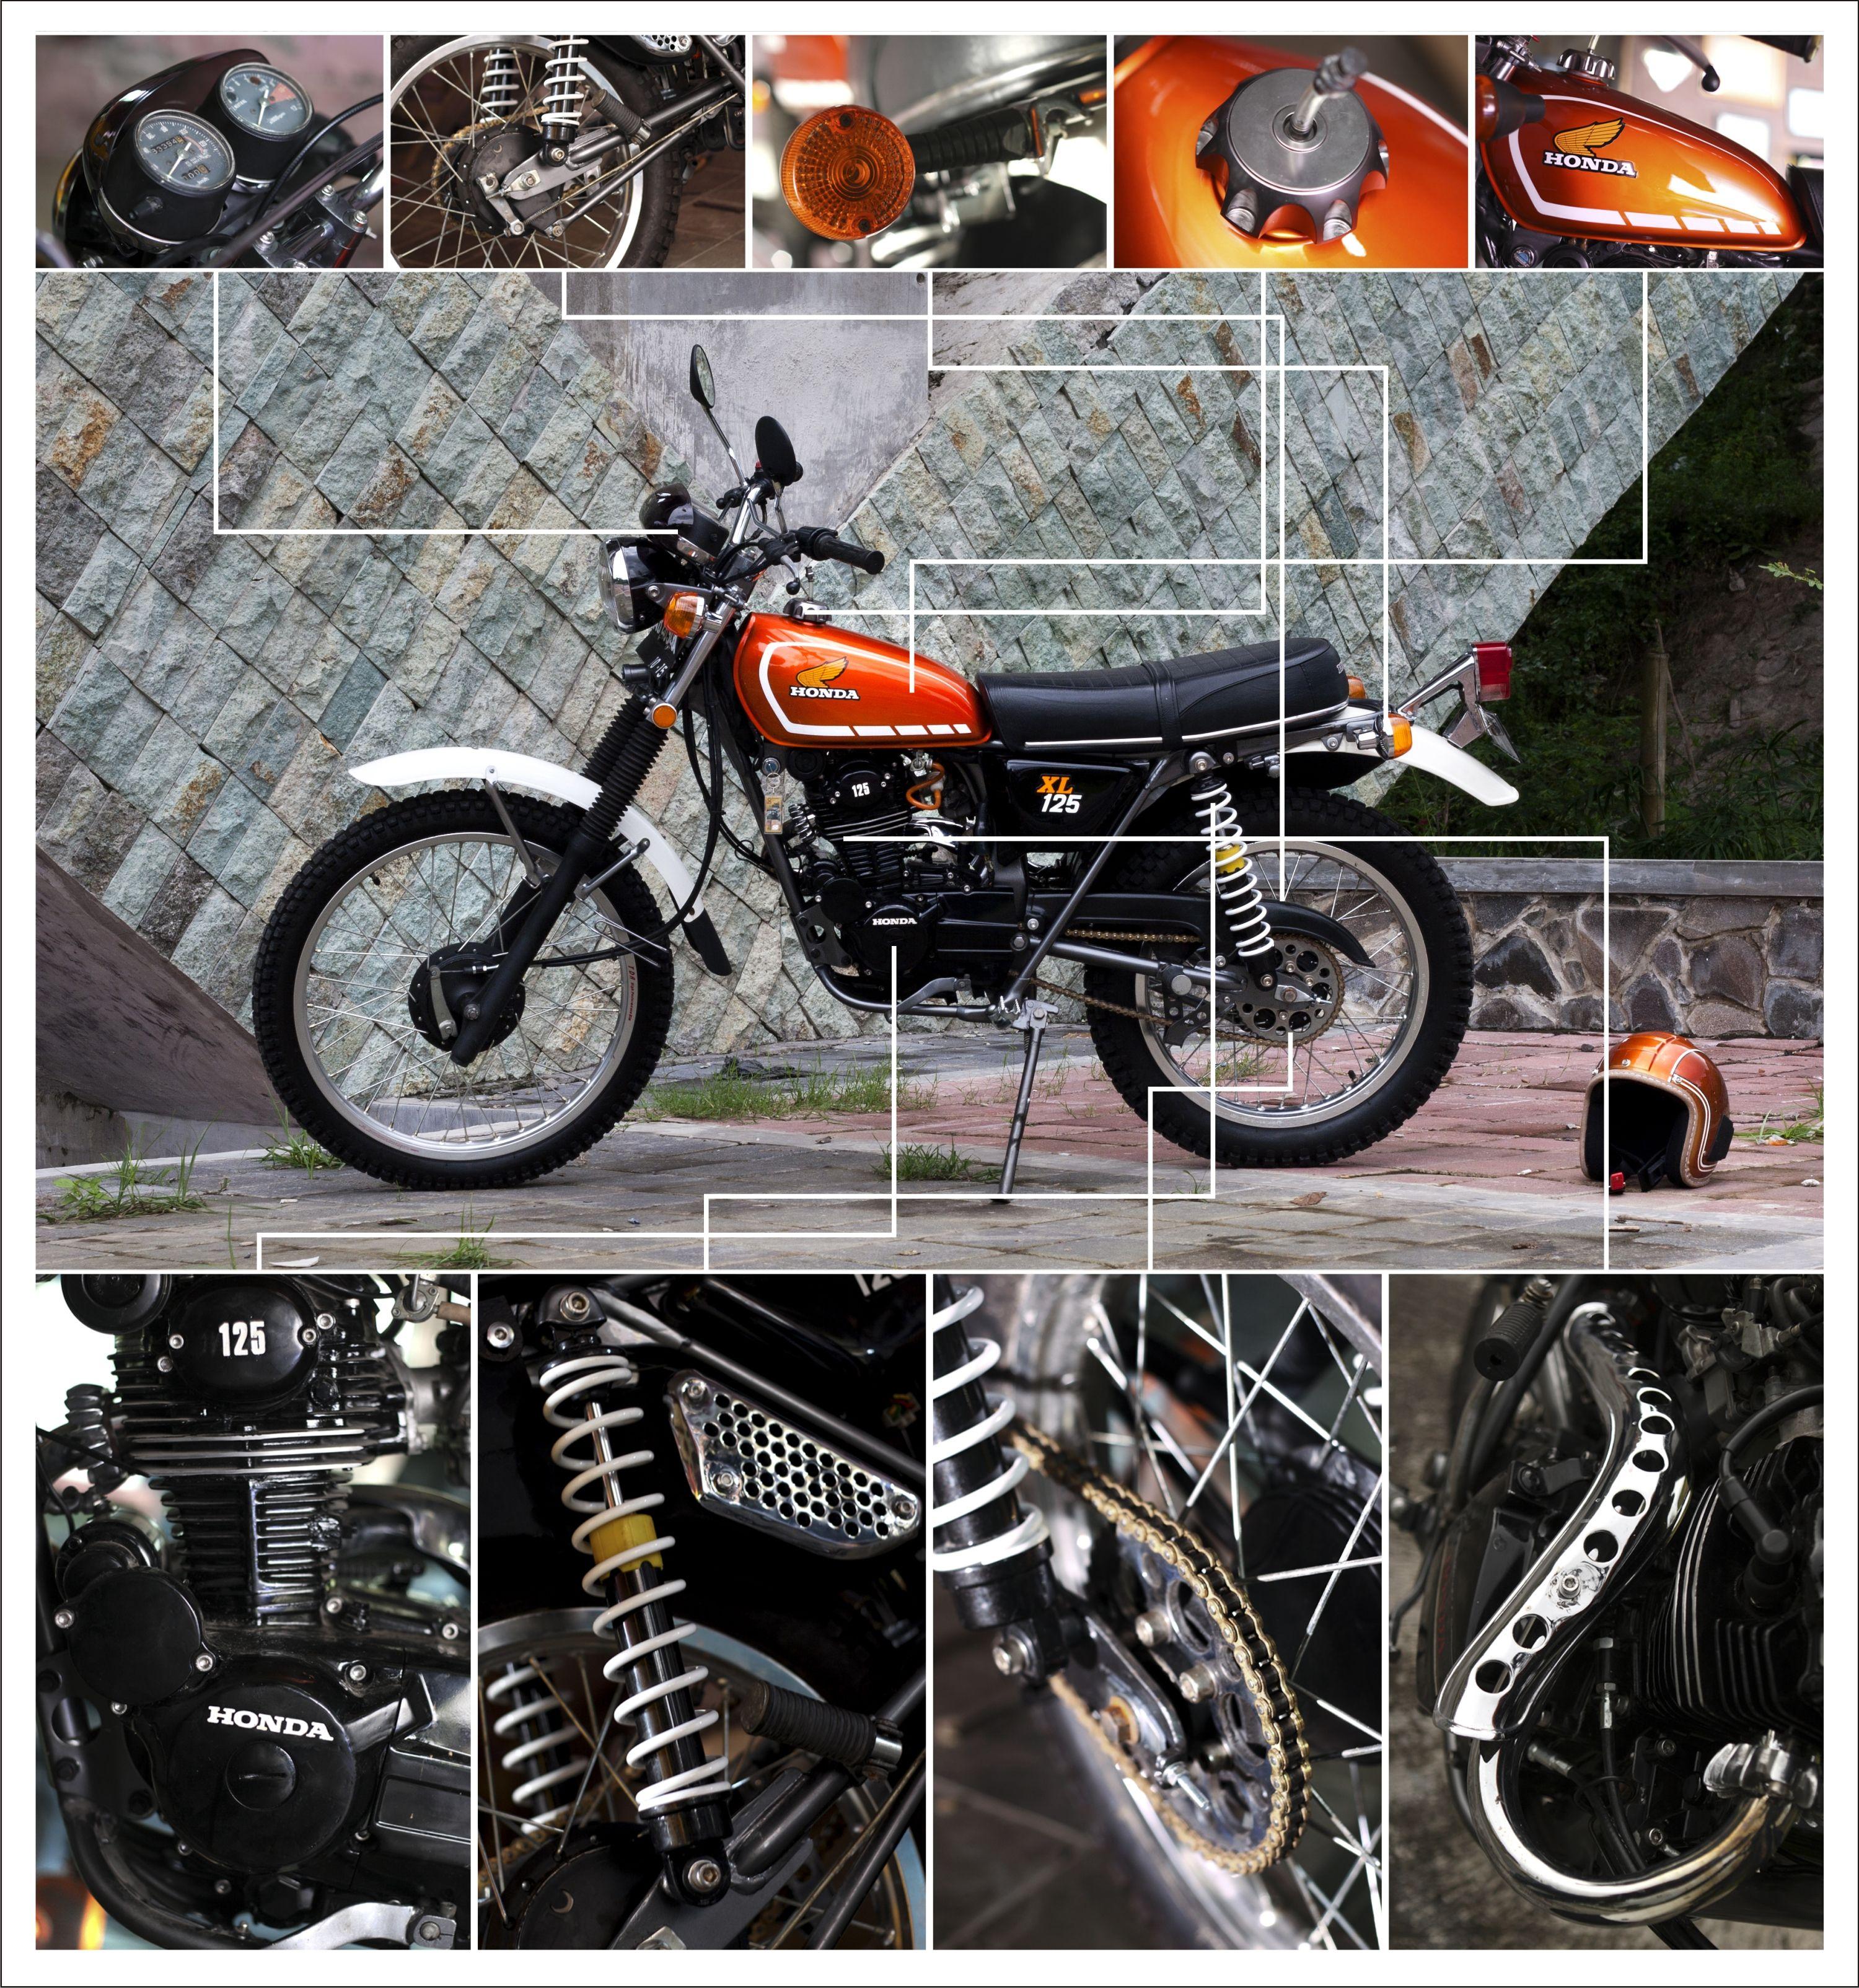 Restoration 1975 Honda Xl 125 Part S Paint Job Bore Up Engine